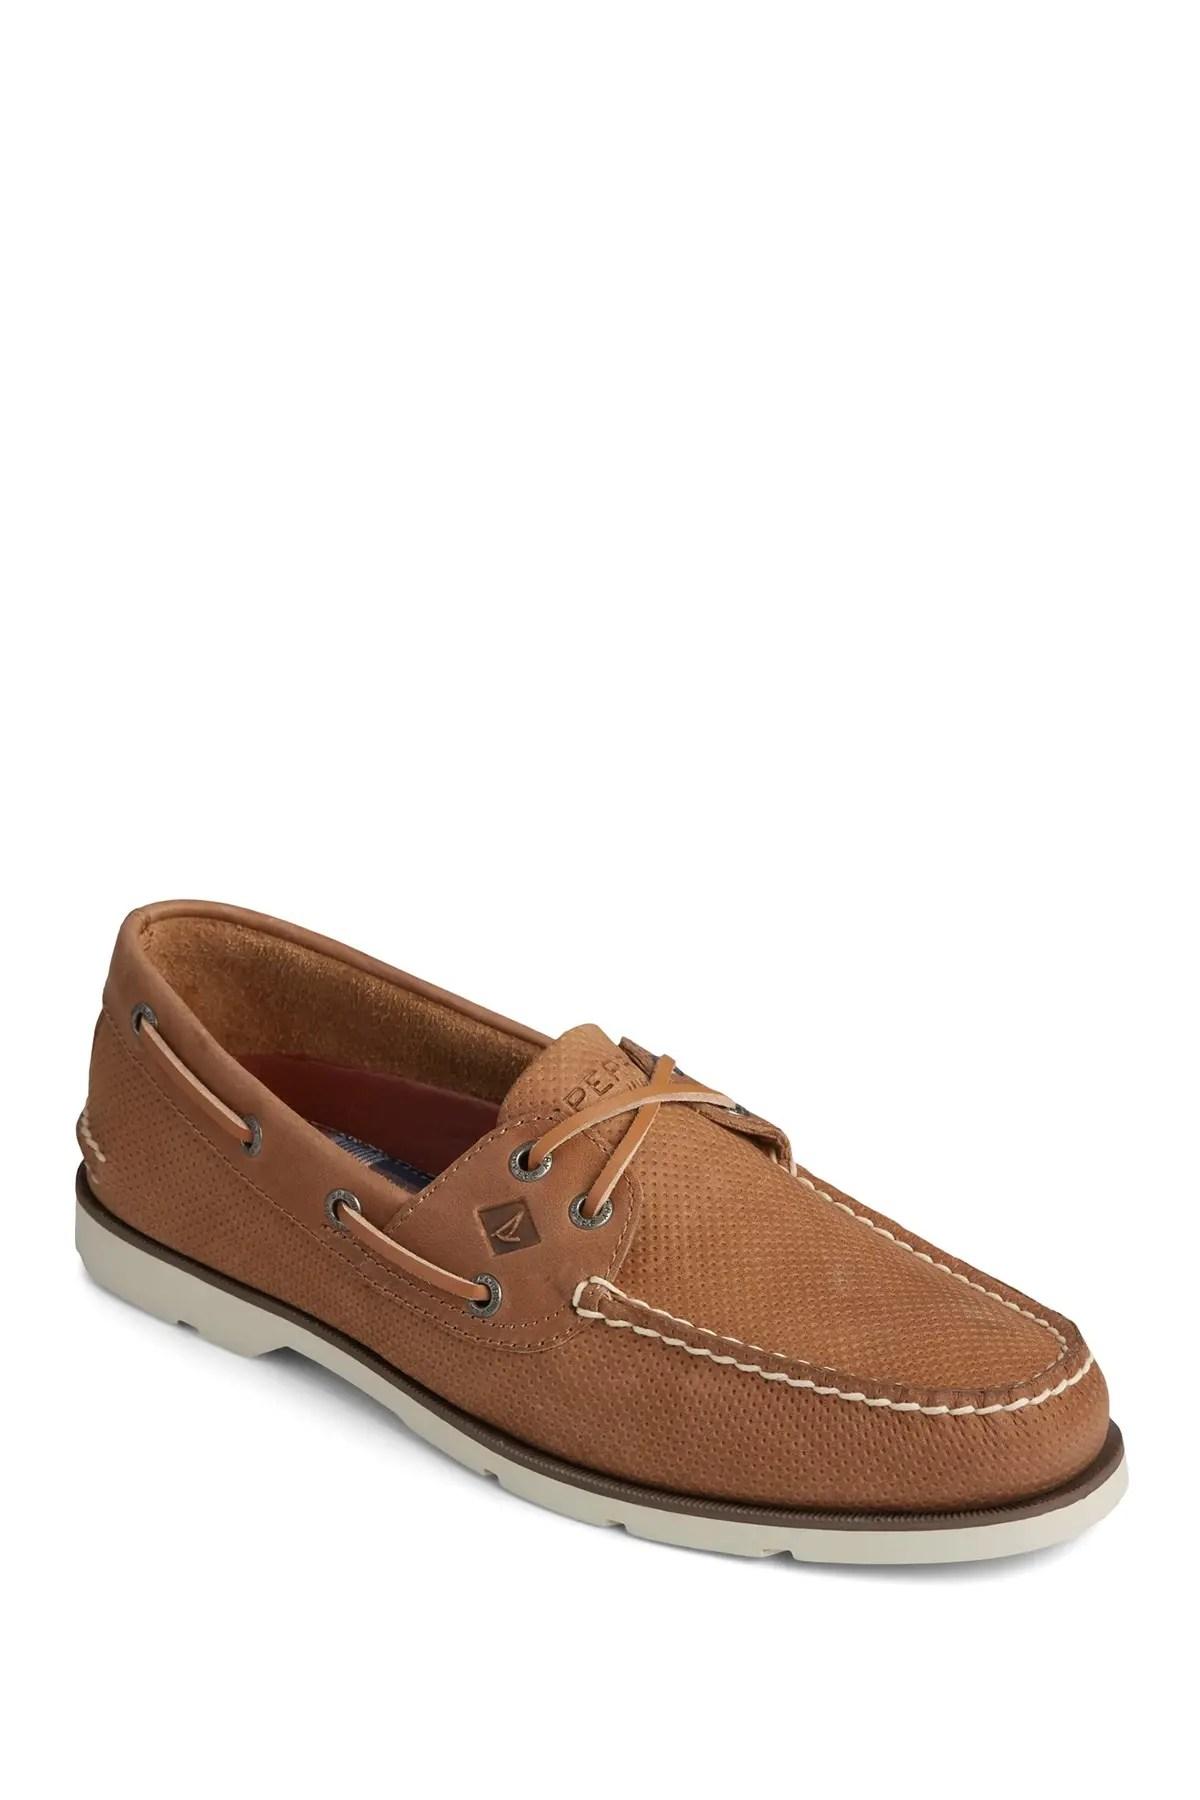 sperry shoes for men nordstrom rack